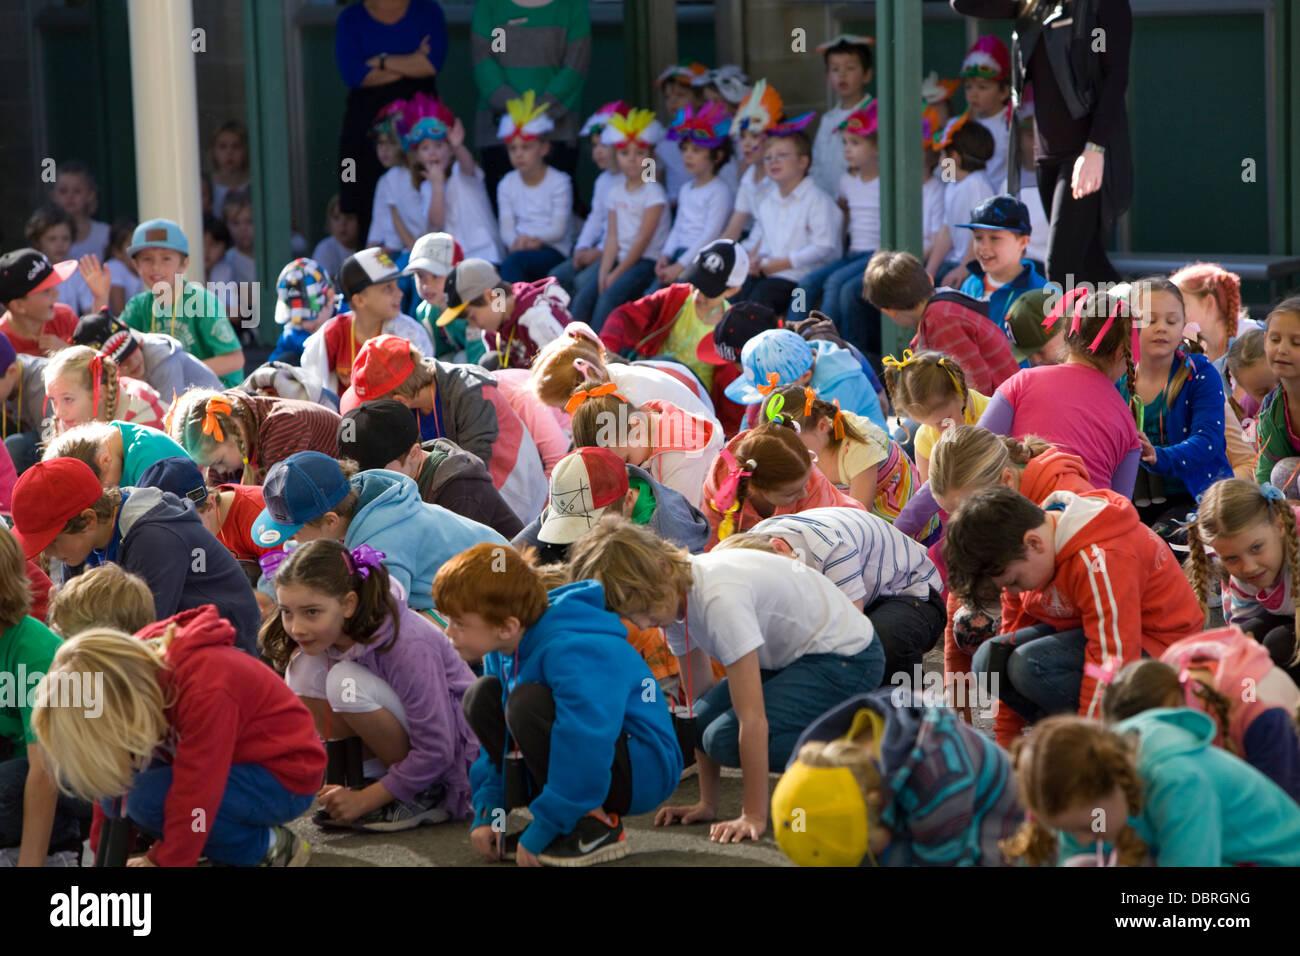 australian primary school children performing at their school open day concert,sydney - Stock Image